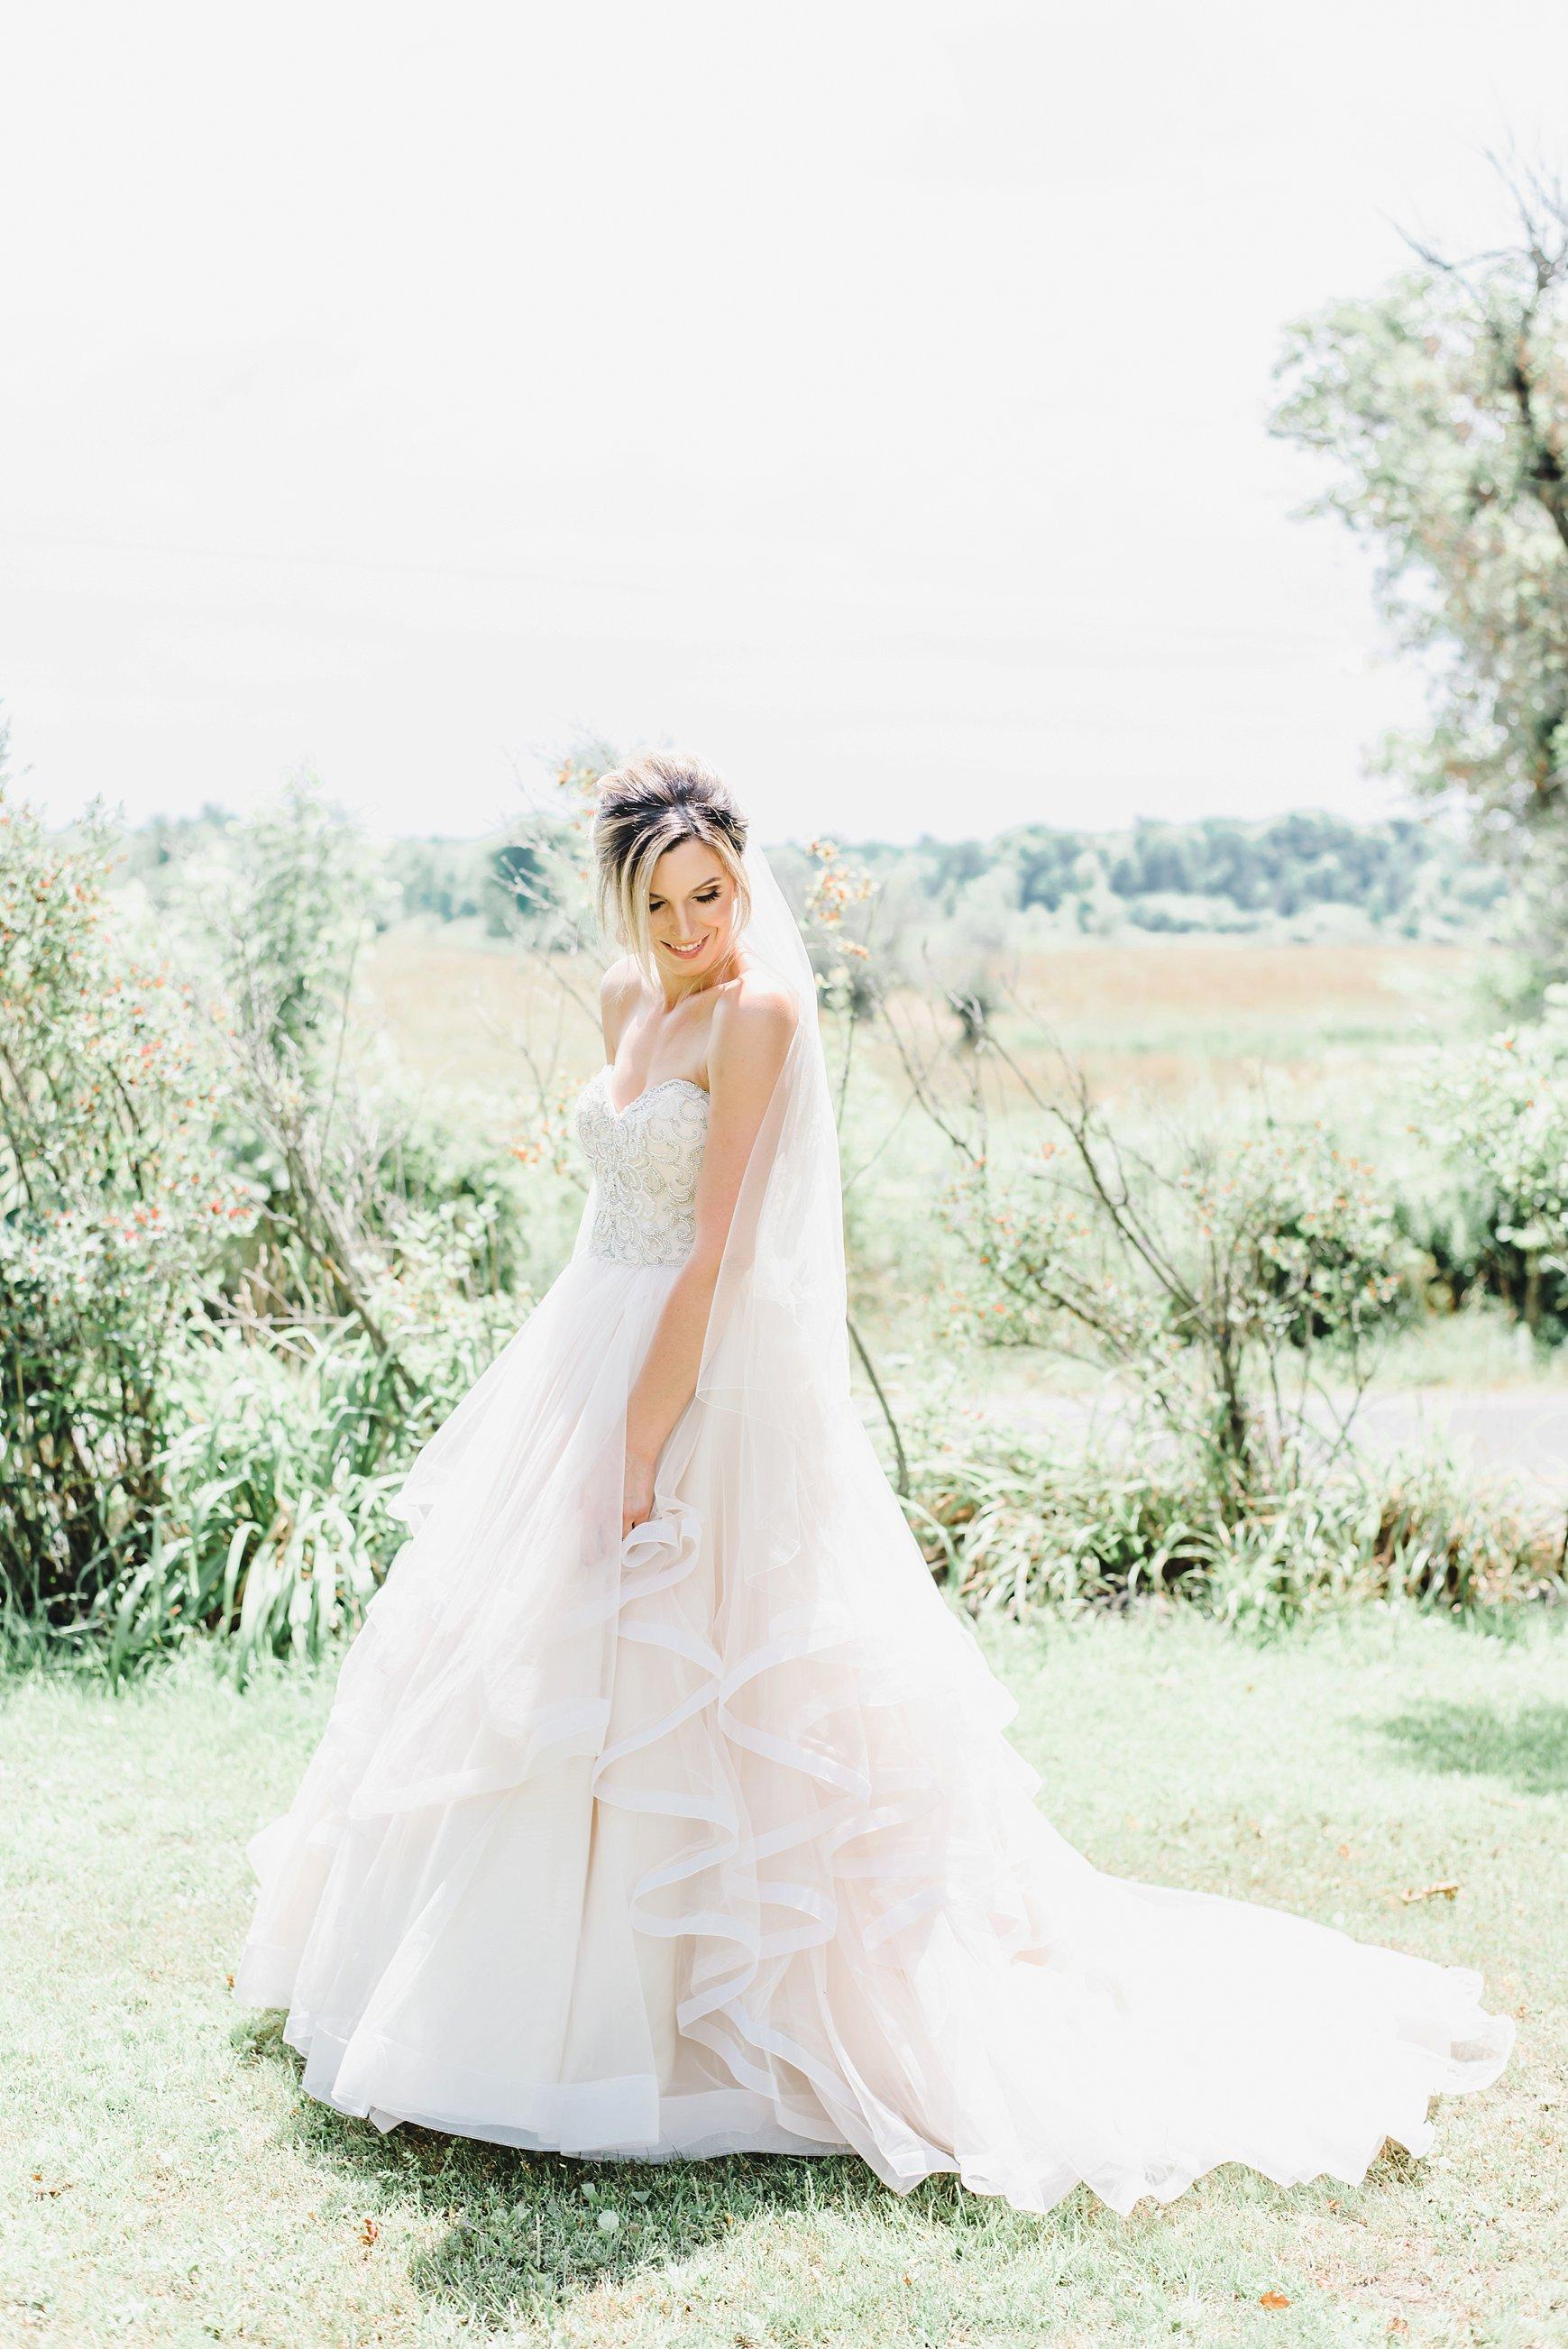 light airy indie fine art ottawa wedding photographer | Ali and Batoul Photography_0141.jpg